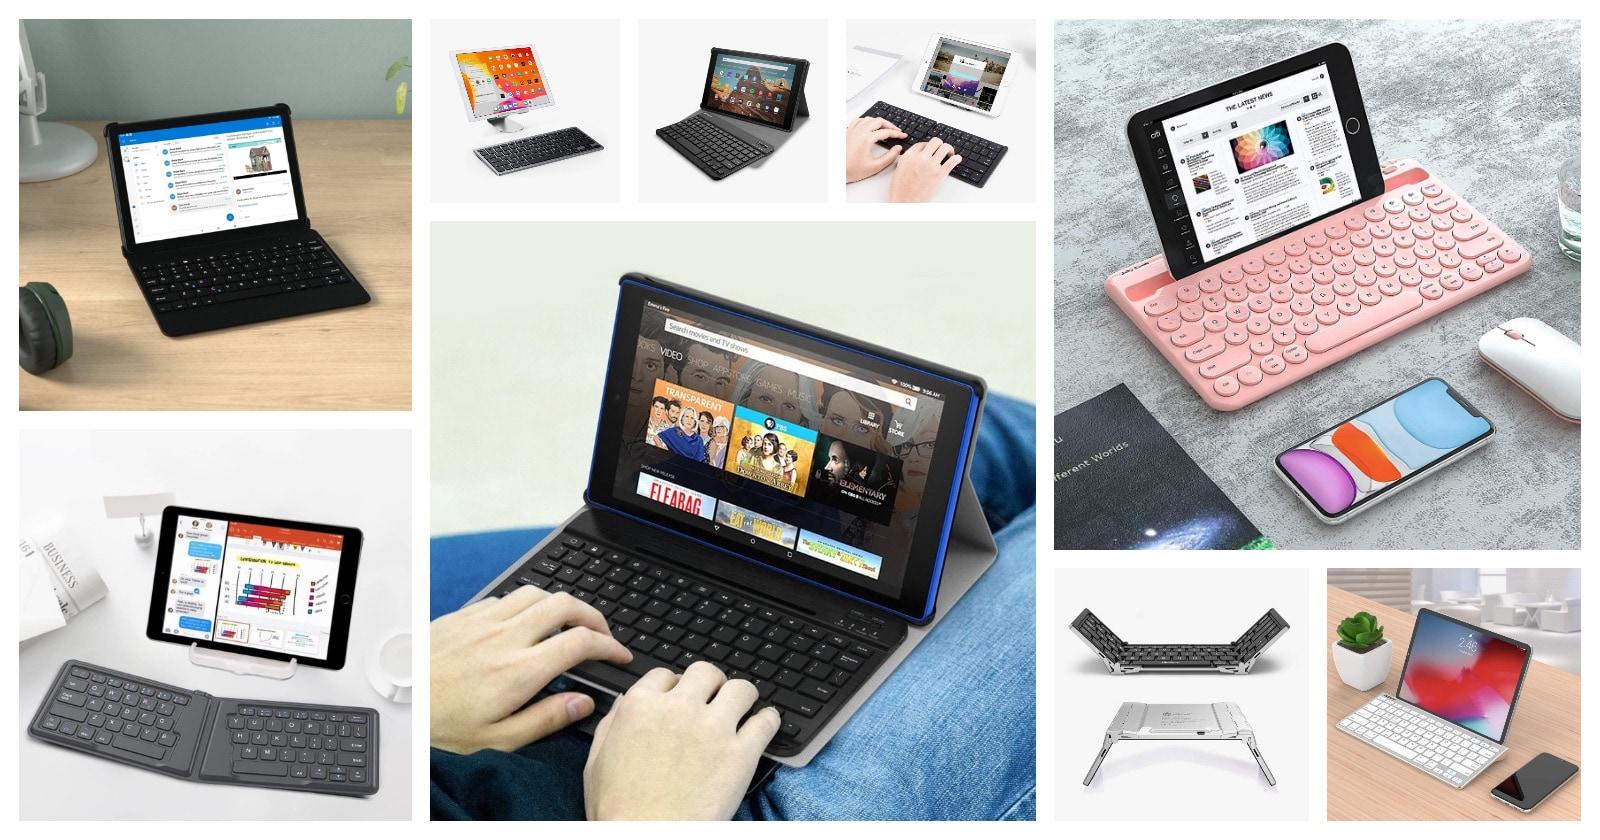 Best Amazon Fire compatible keyboards keyboard cases